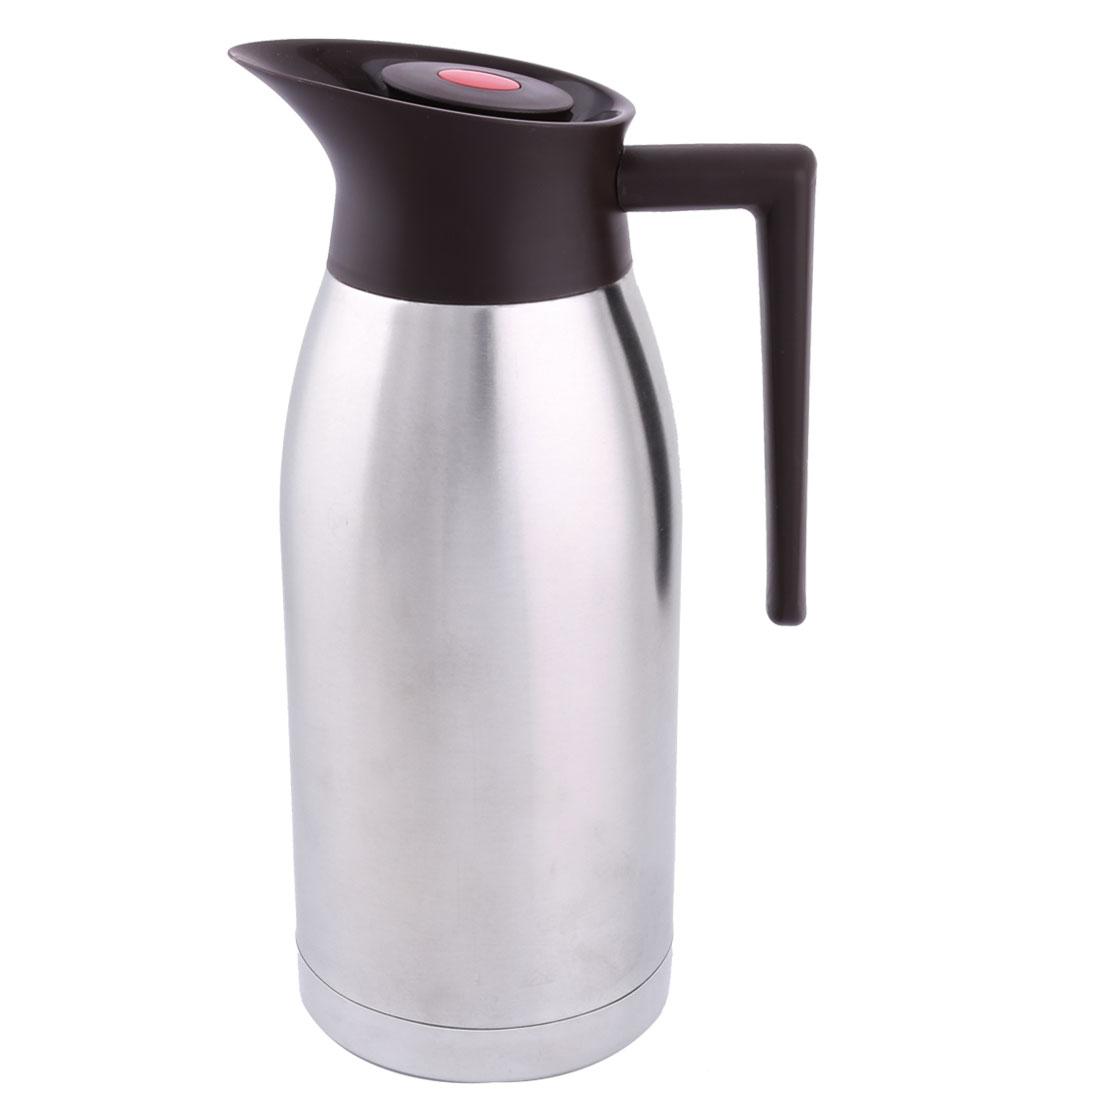 Household Hotal Restaurant Stainless Steel Tea Water Vacuum Heat Retaining Pot 2.6L